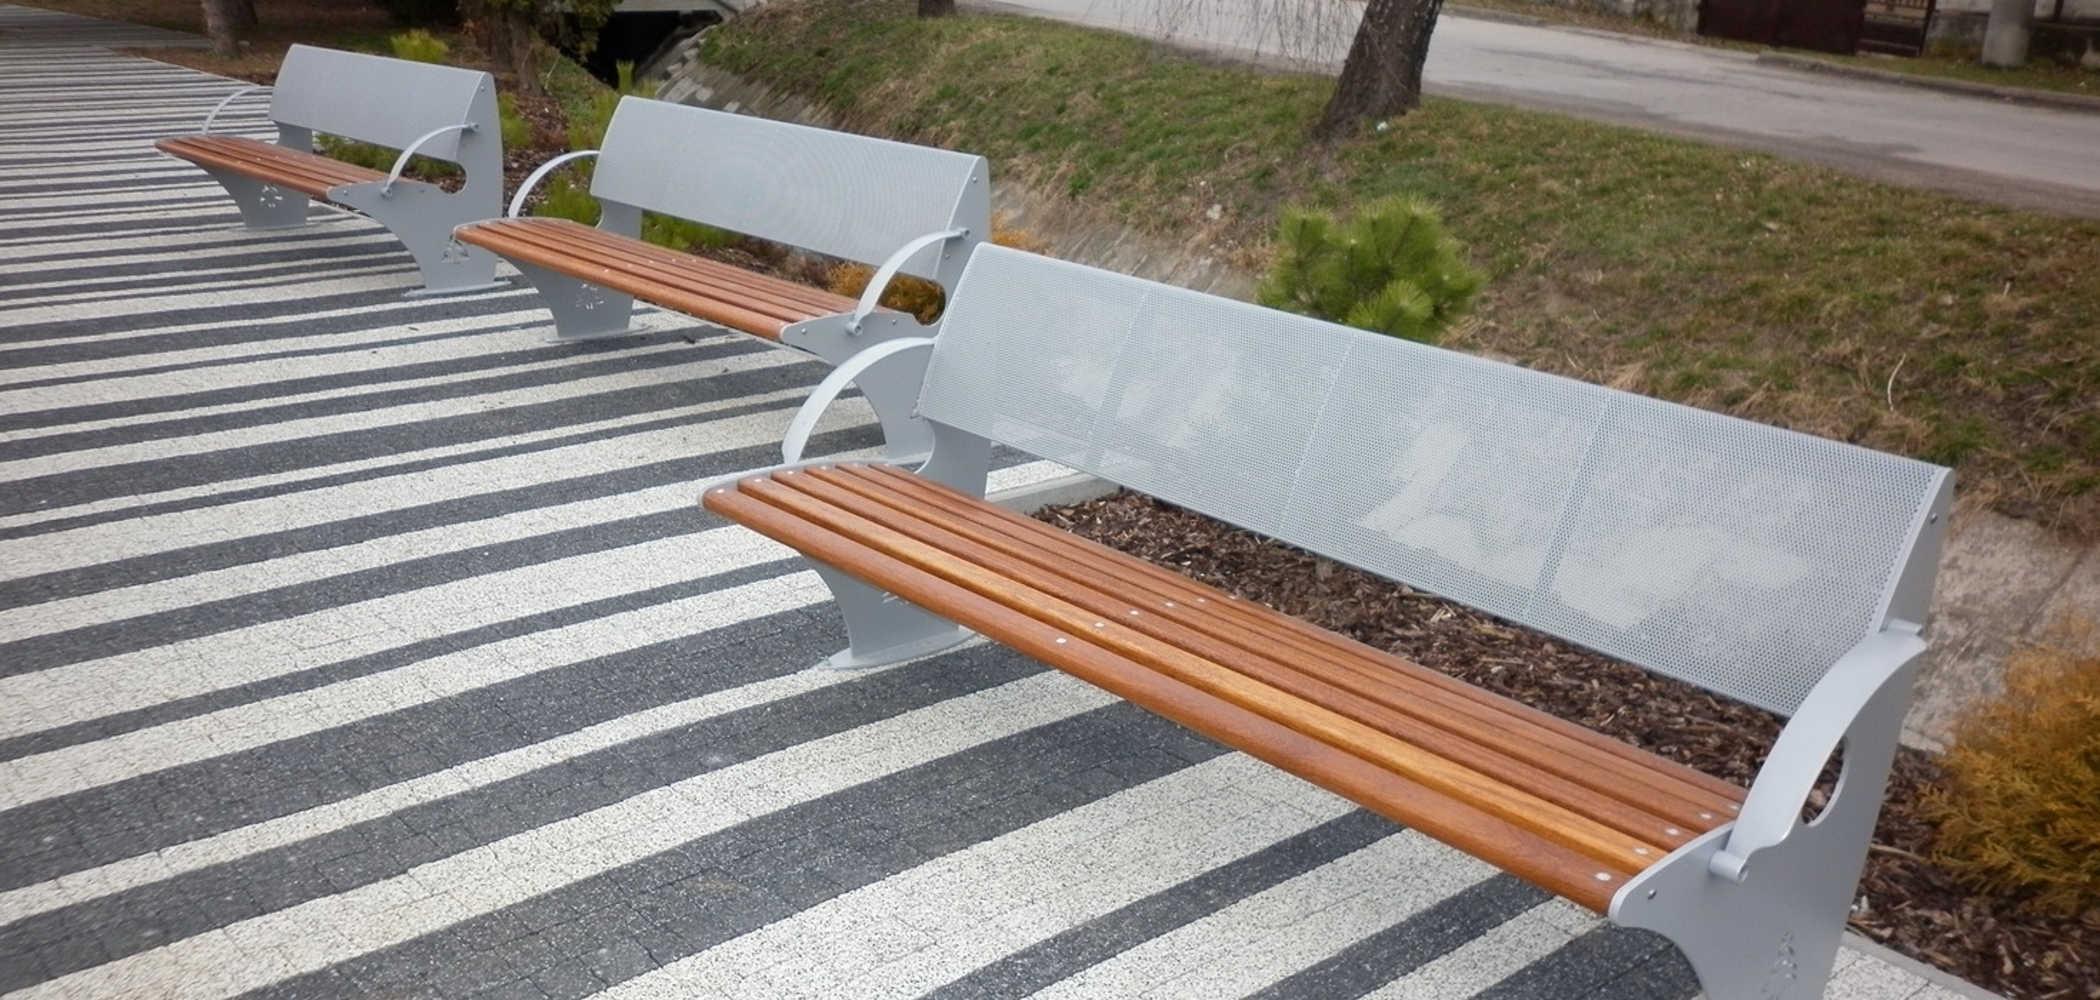 Panchina curva lucky metalco for Panchine da giardino ikea